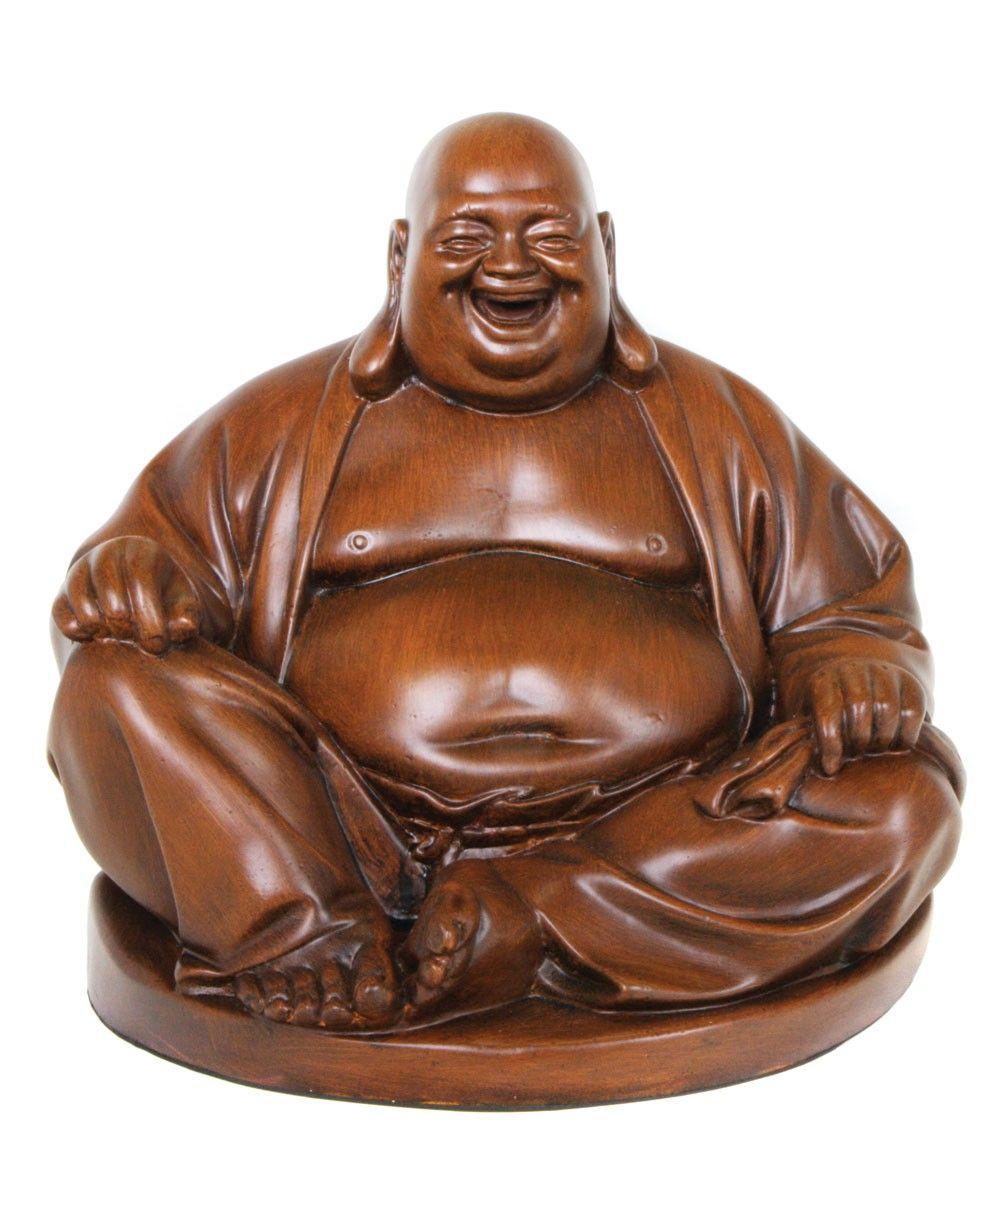 Very Big Lucky Traveling Buddha Hotei Wood Carving Statue Handmade Bali Art Art